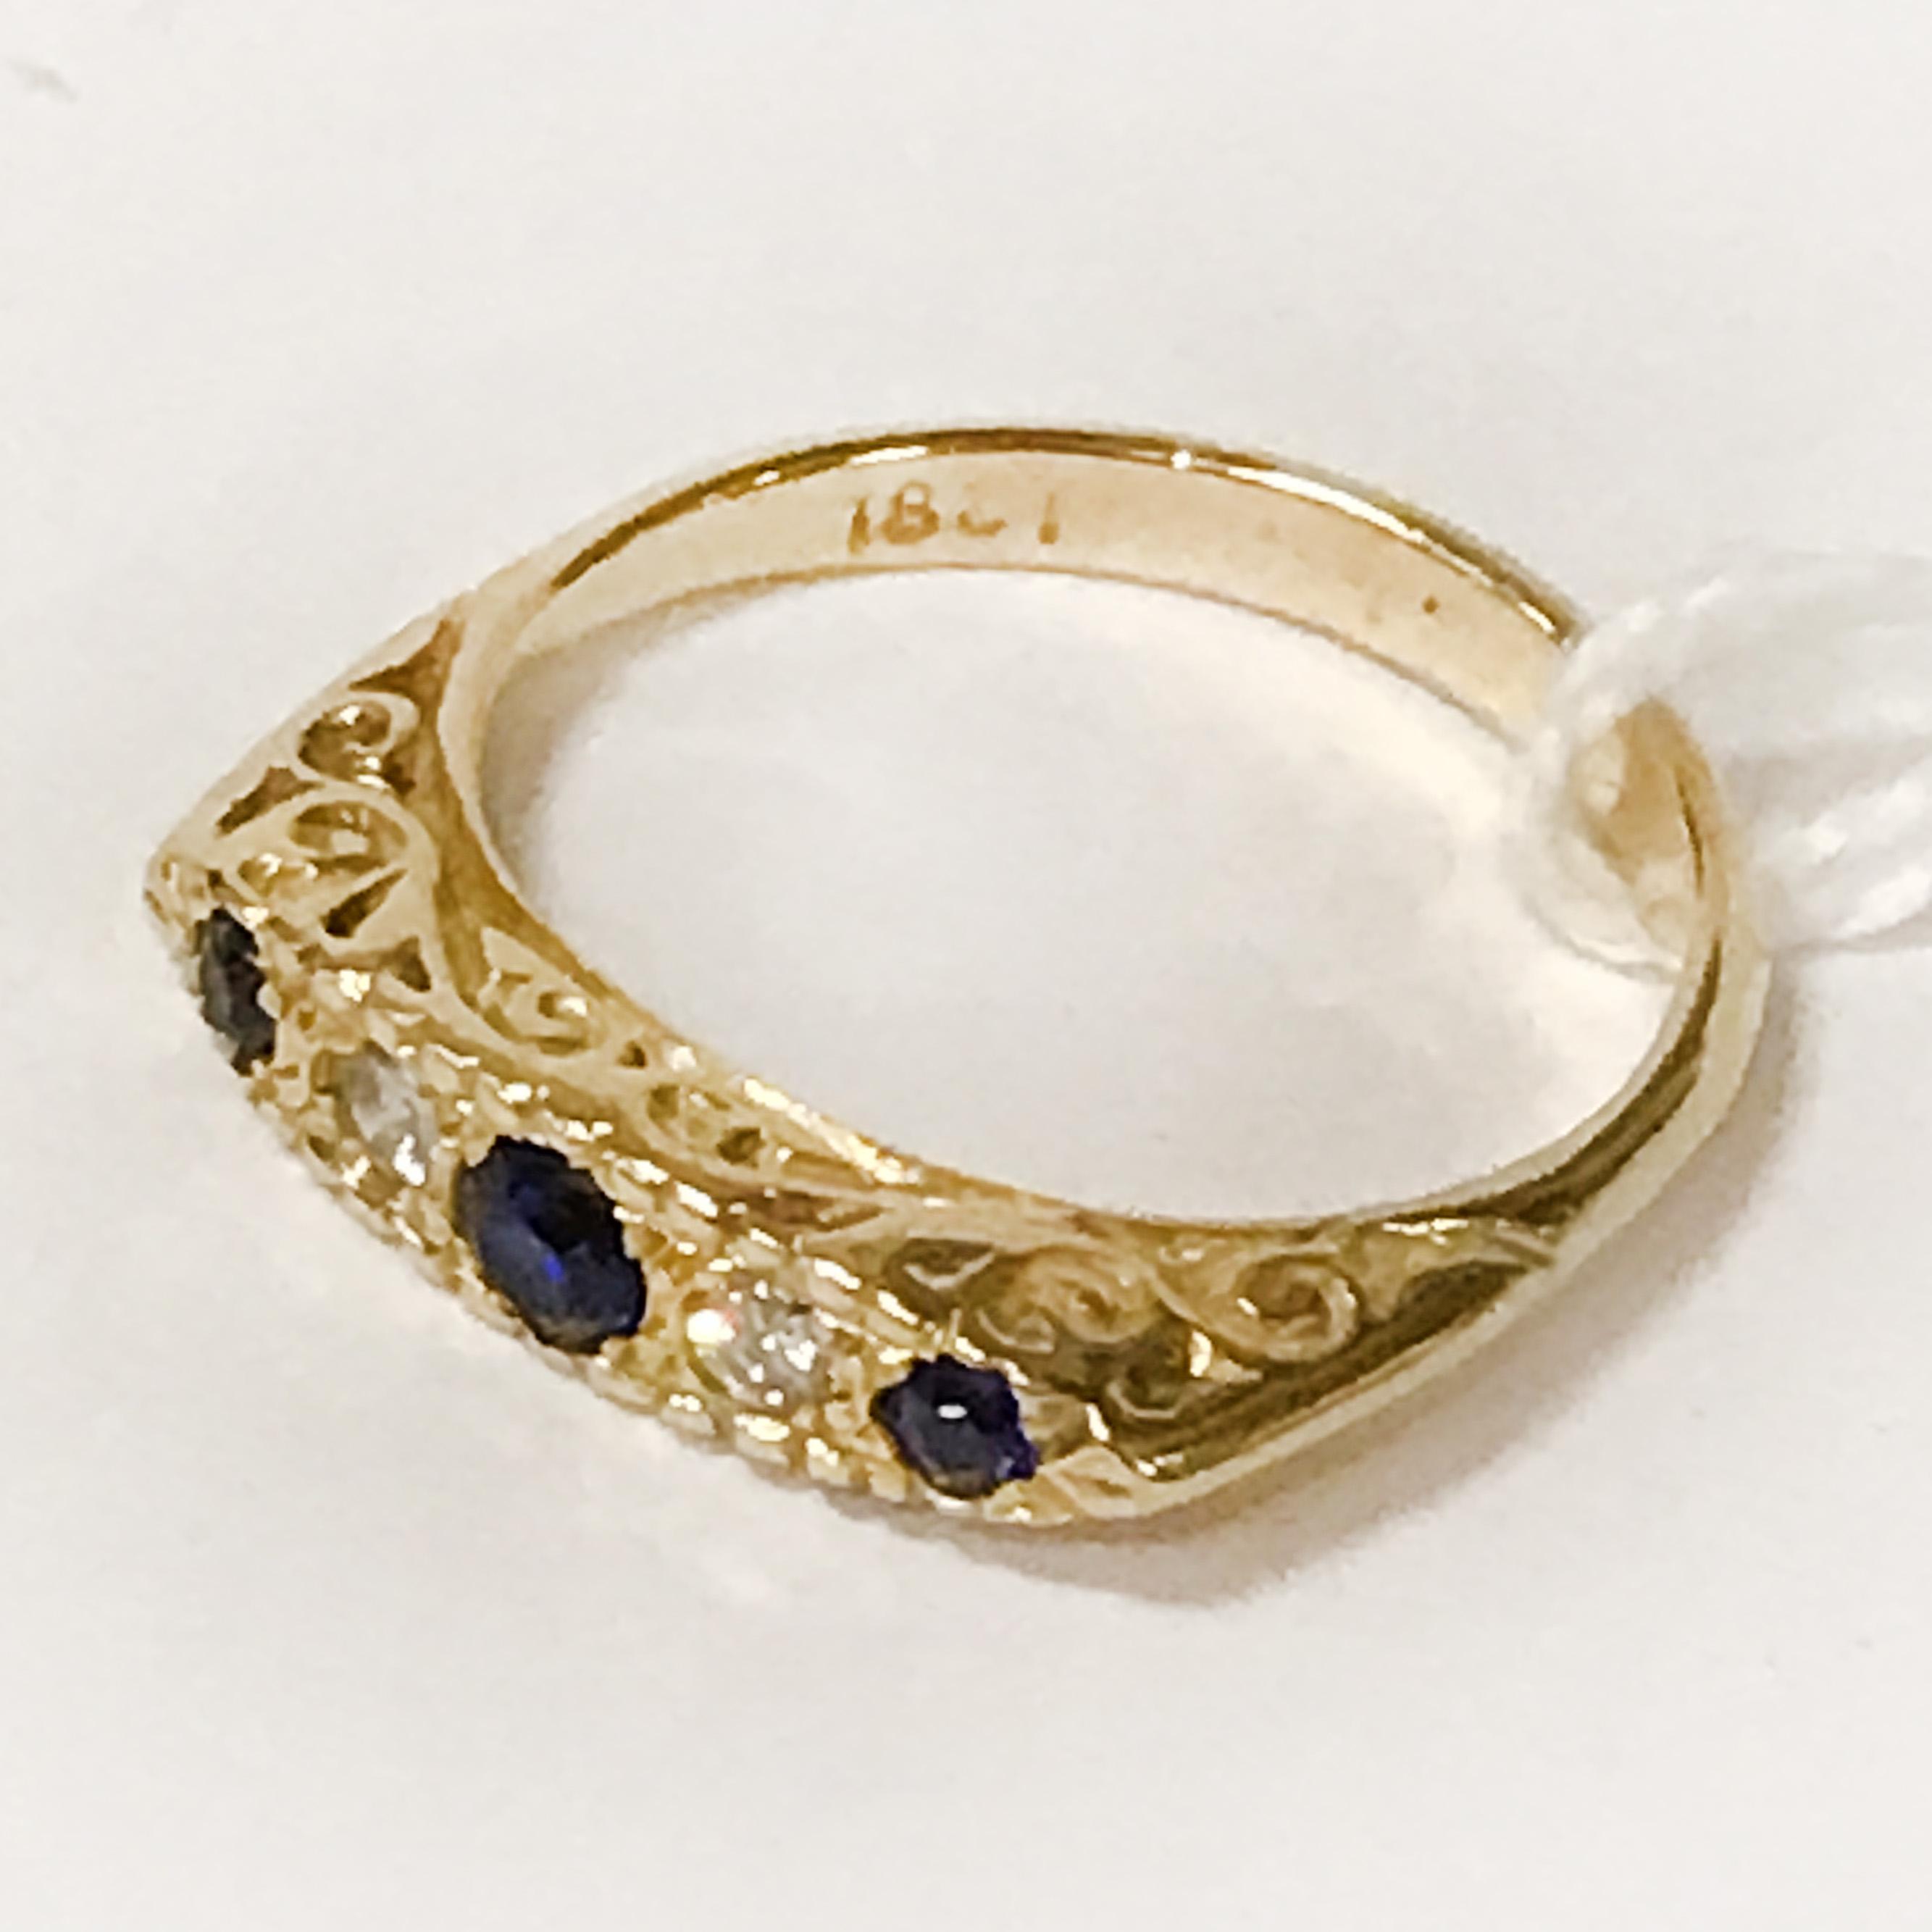 18CT YELLOW GOLD DIAMOND & SAPPHIRE RING - SIZE M